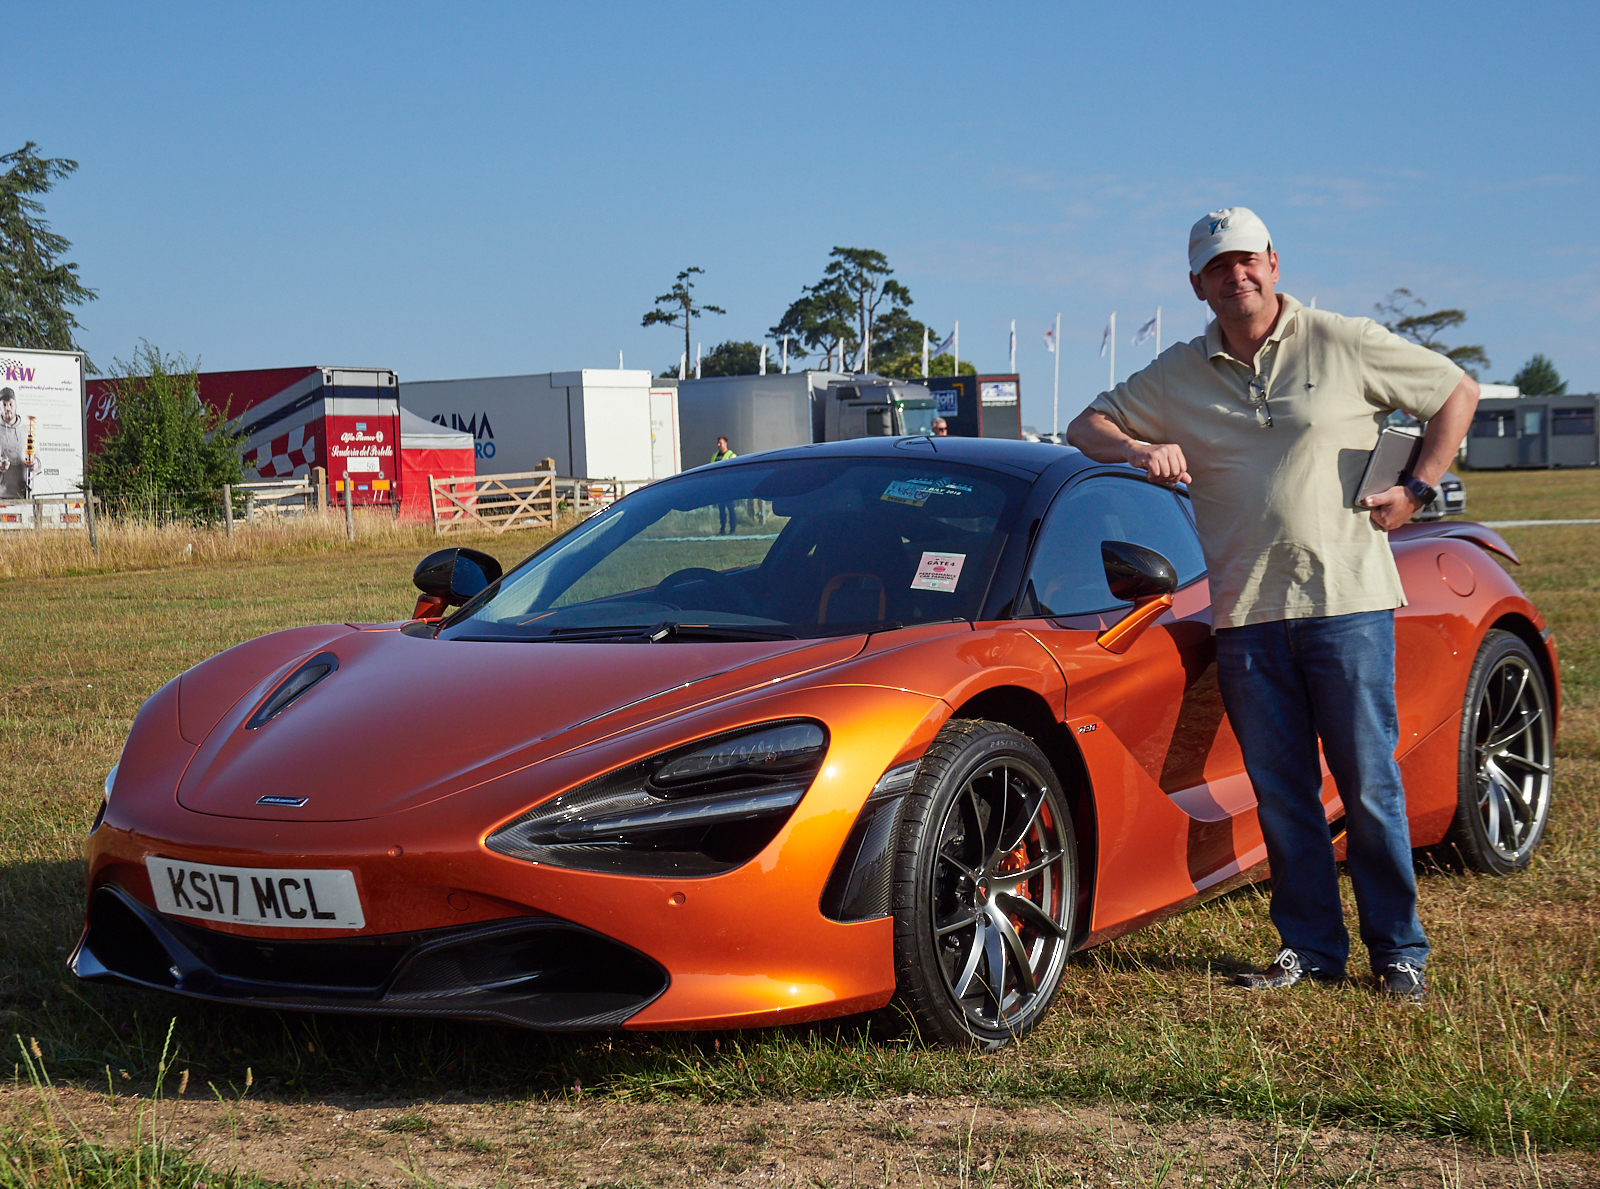 Miguel and McLaren1600x1200 sRGB.jpg